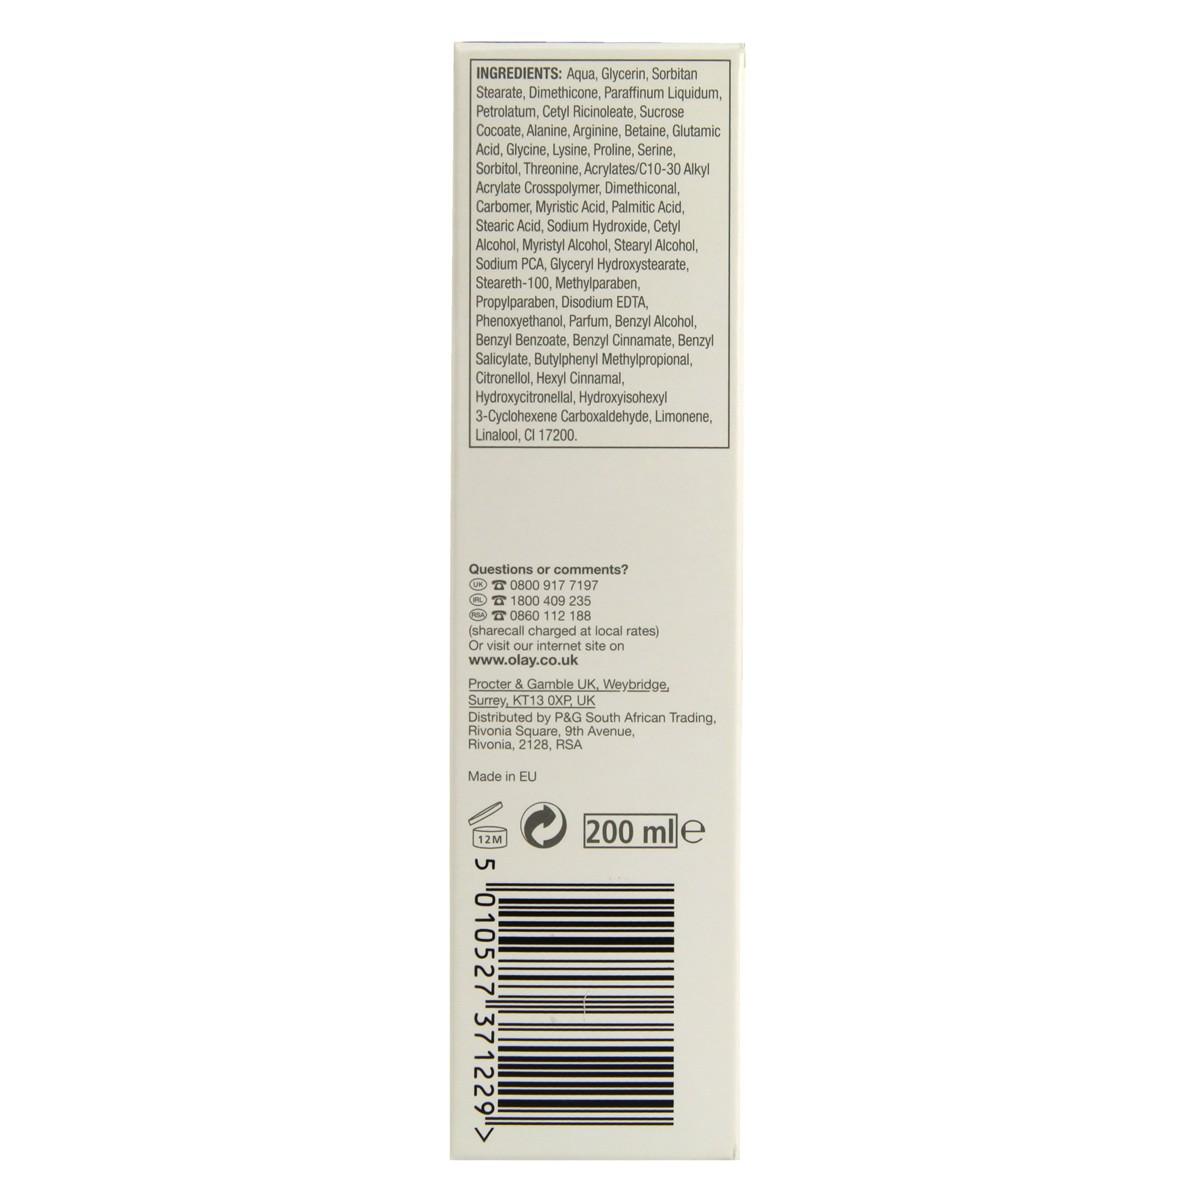 Olay Nourishing Beauty Fluid - Normal/ Dry/ Combination Skin